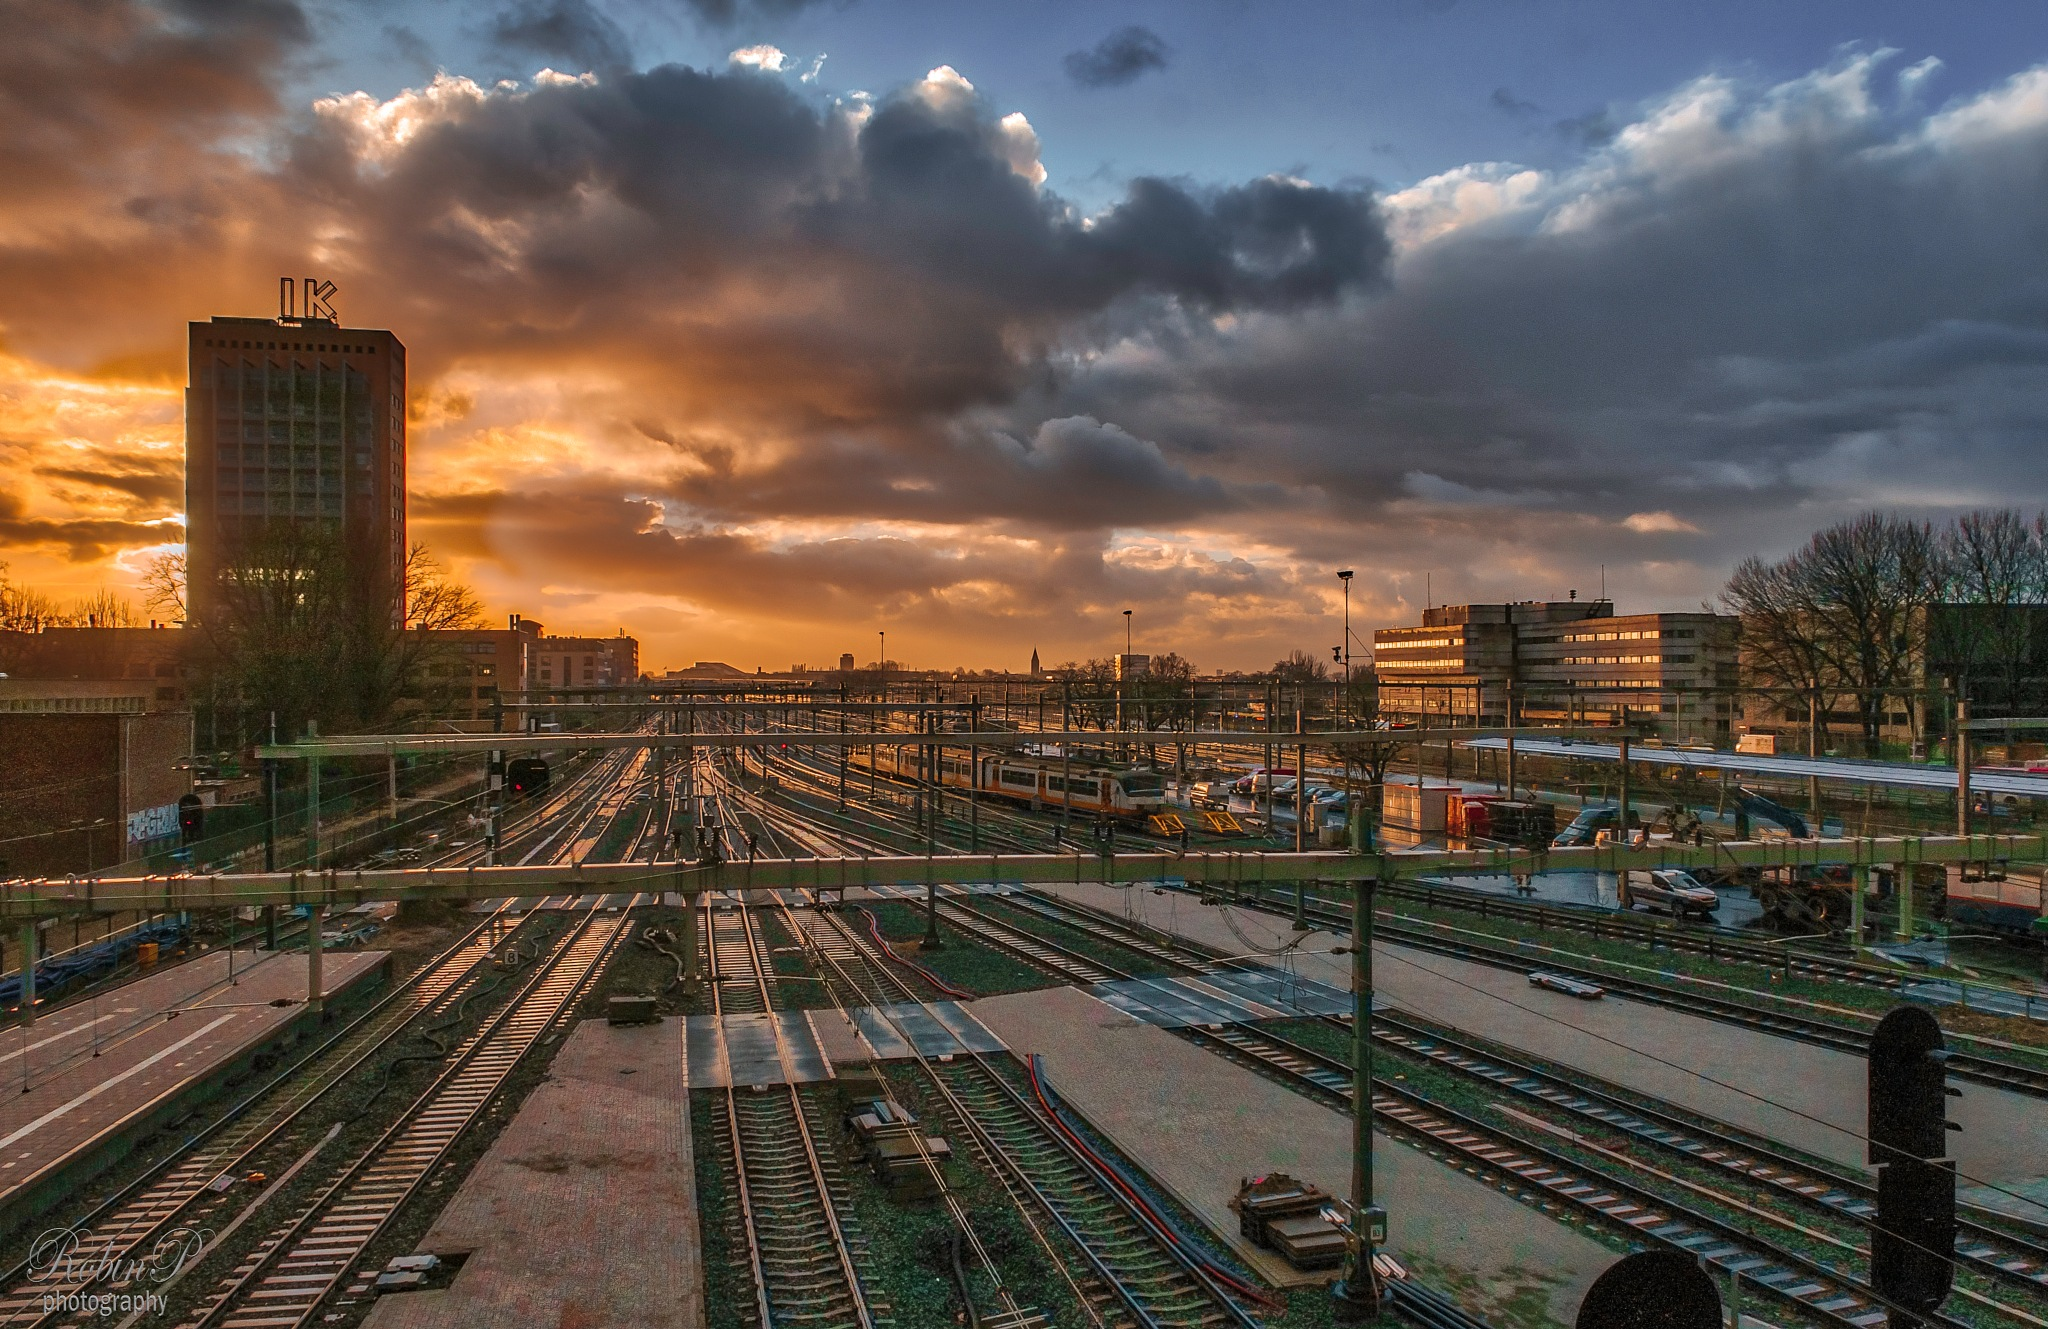 trainstation, Utrecht. by Robin Pulles